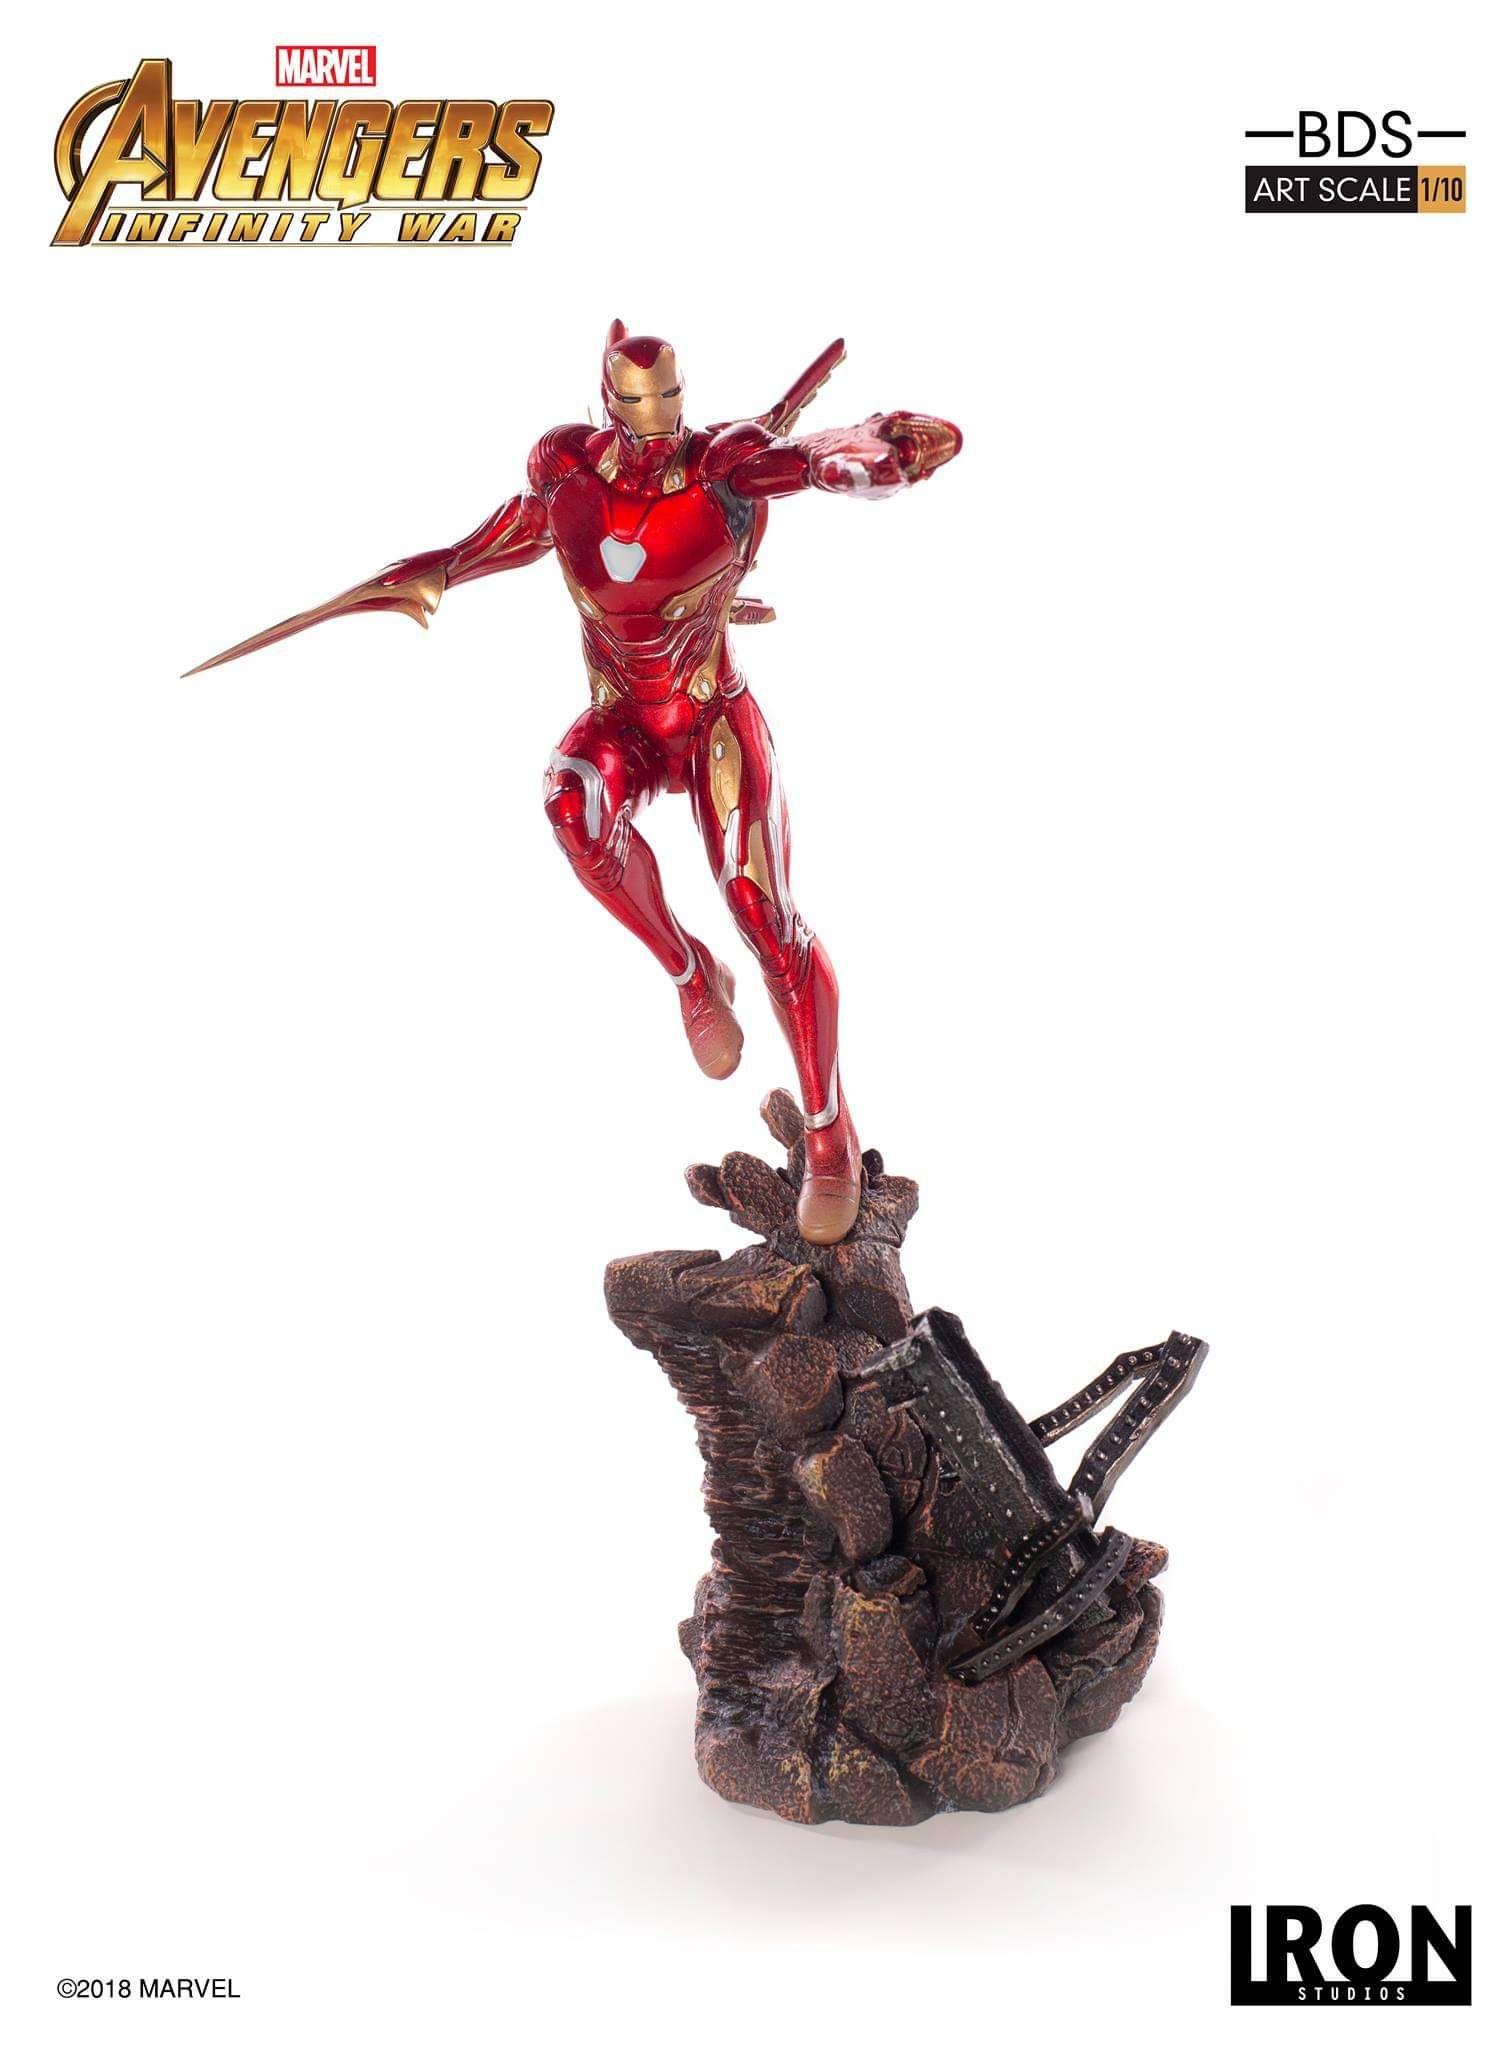 Pin By Jaeeun Be On Marvel Avengers Infinity War Marvel Iron Man Iron Man